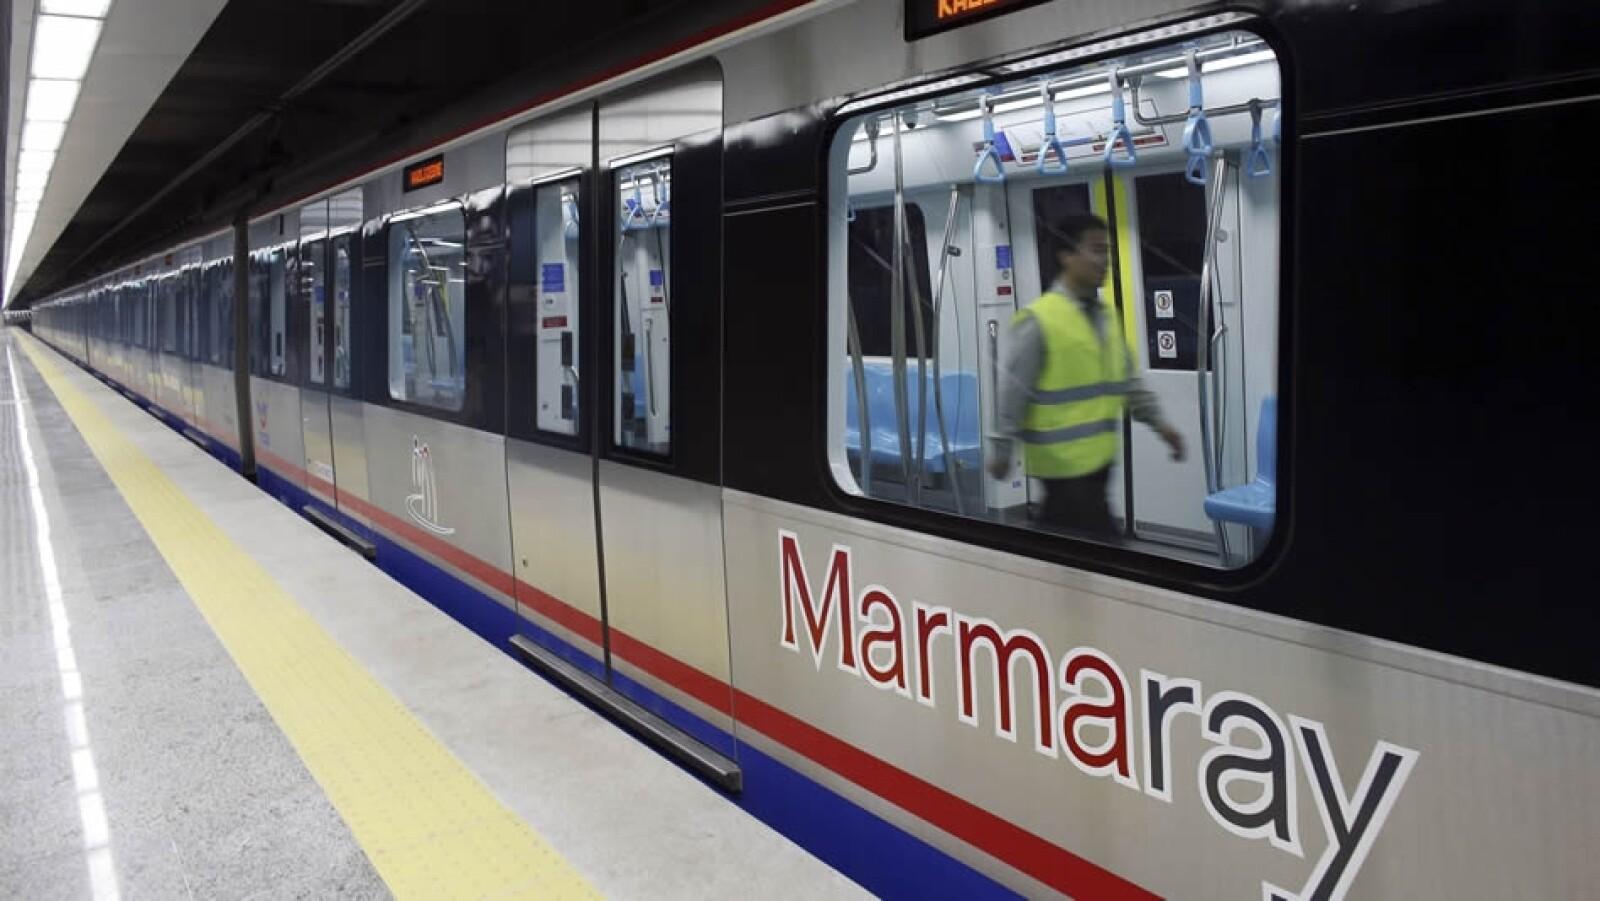 Marmaray tren Turquía 2